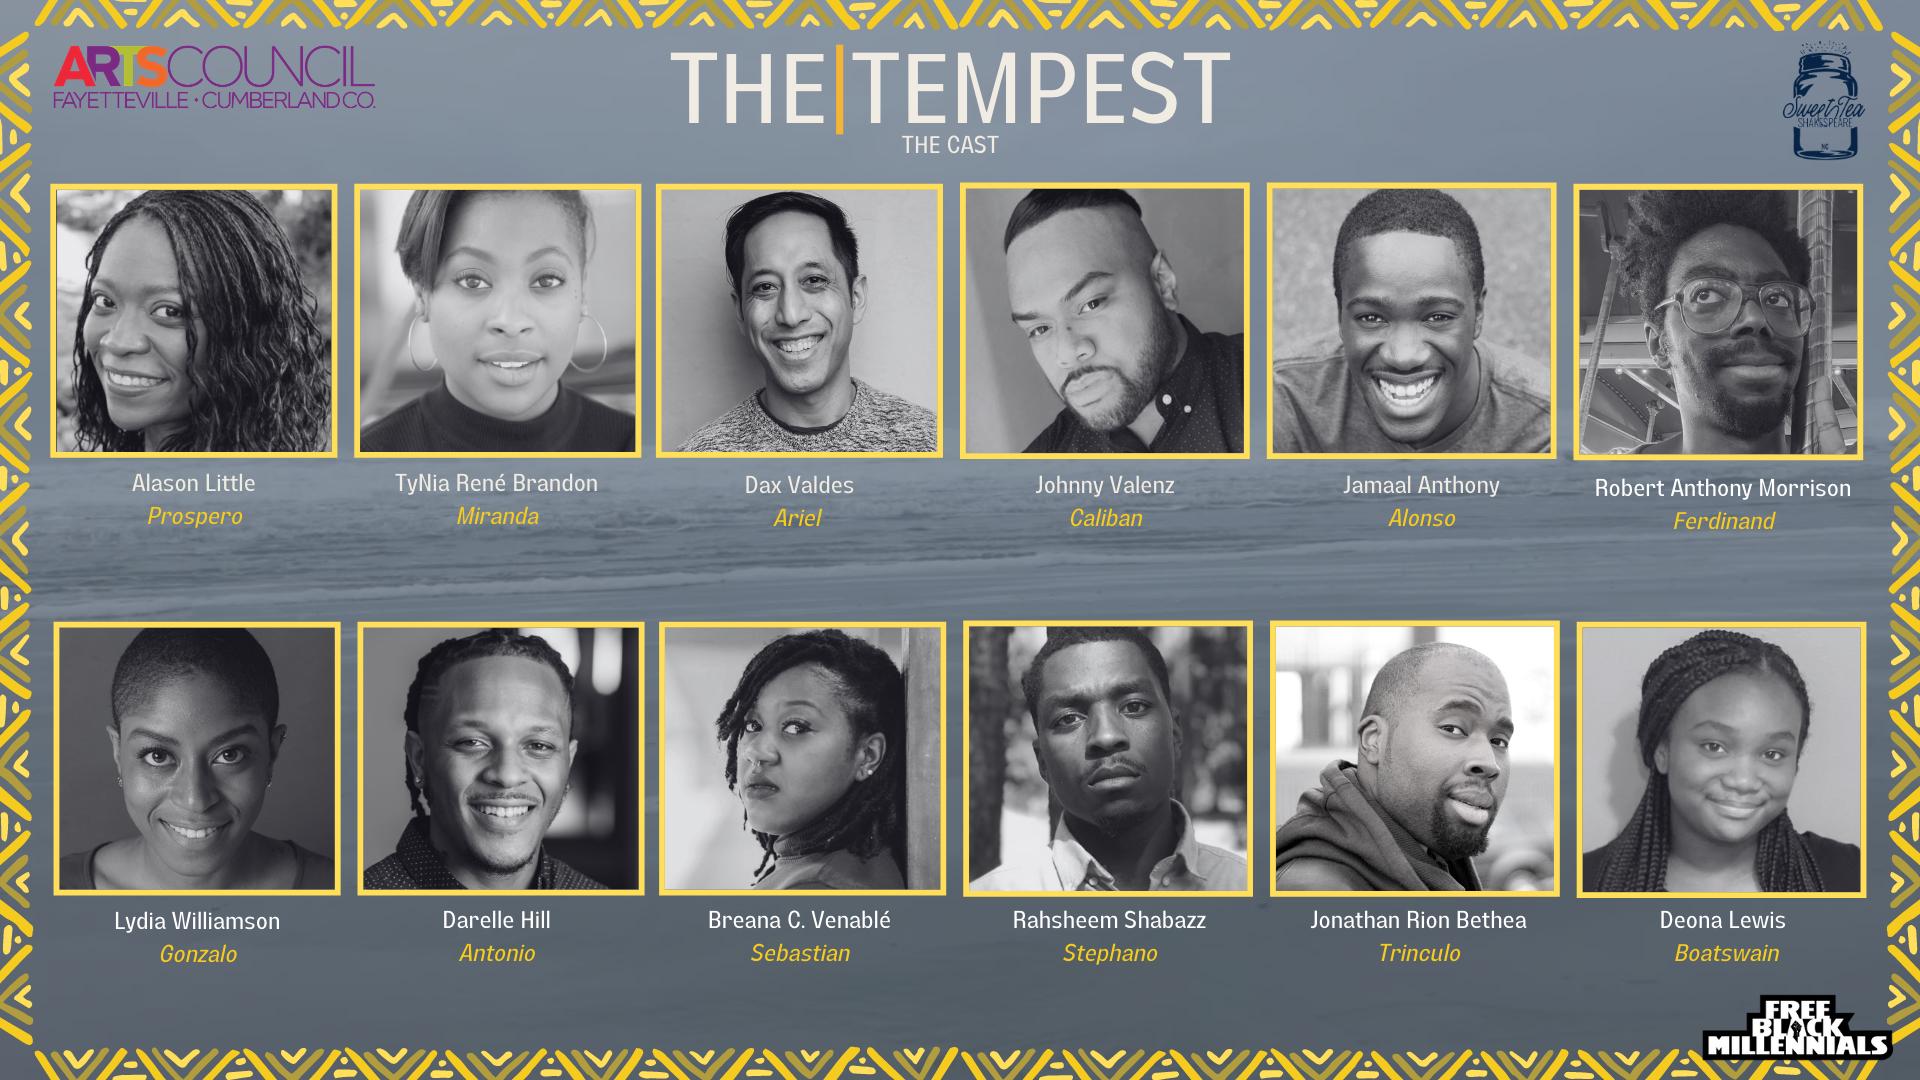 The Tempest Cast